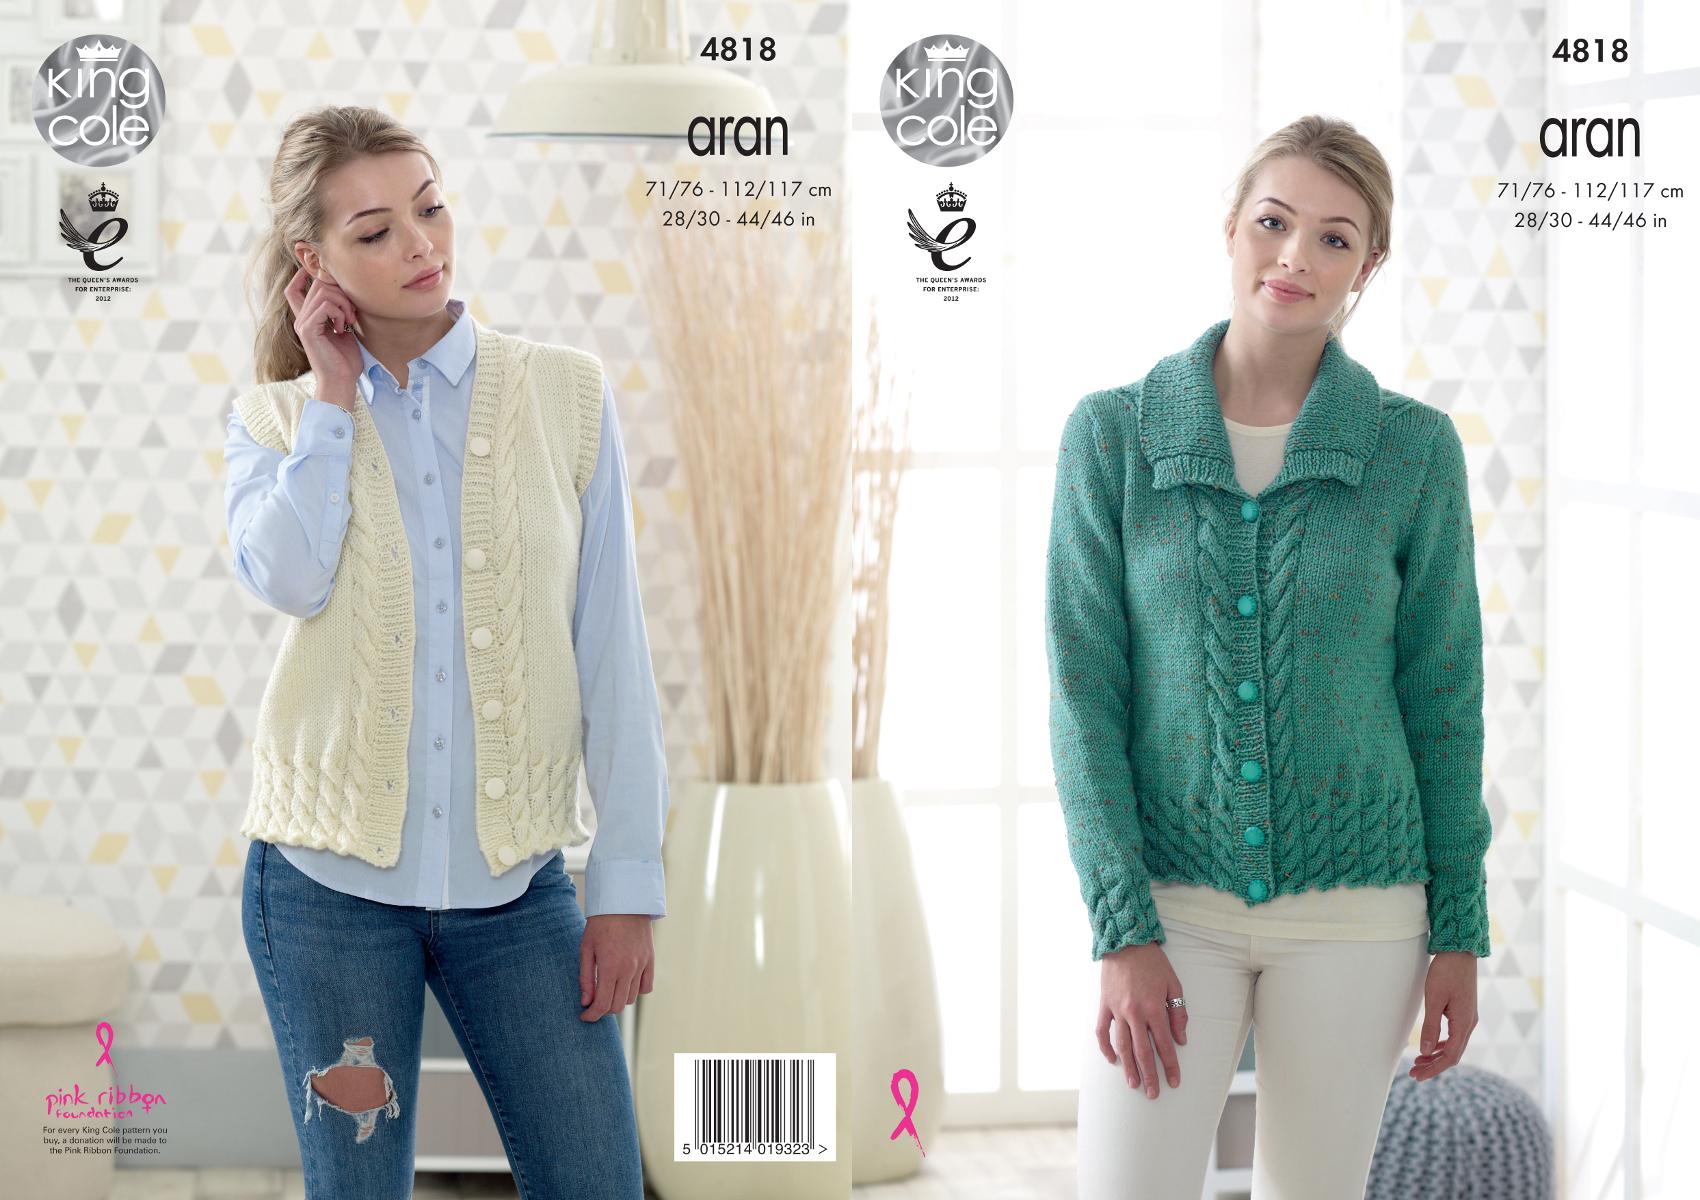 King Cole Ladies Aran Knitting Pattern Womens Cable Knit Jacket ...